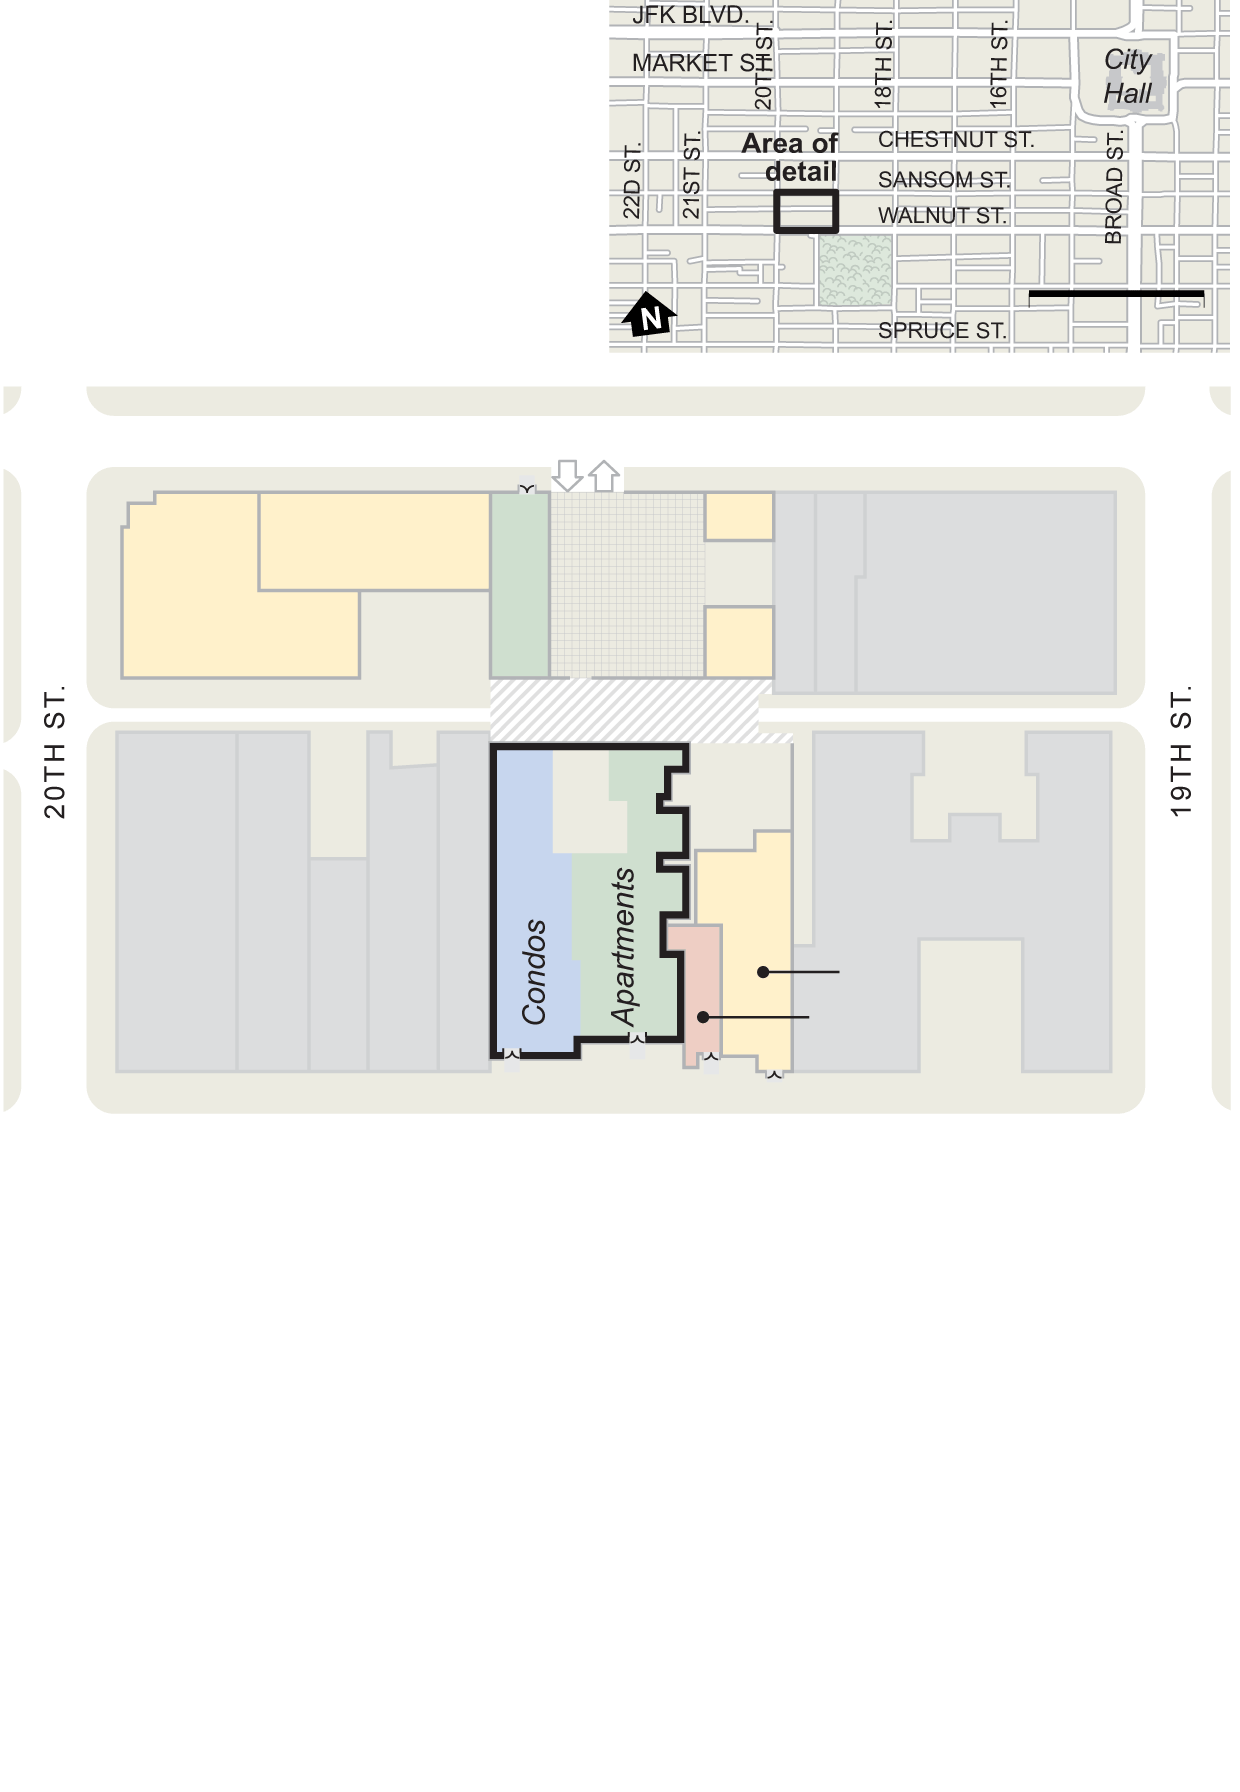 ground floor plans for 1911 walnut philadelphia inquirer